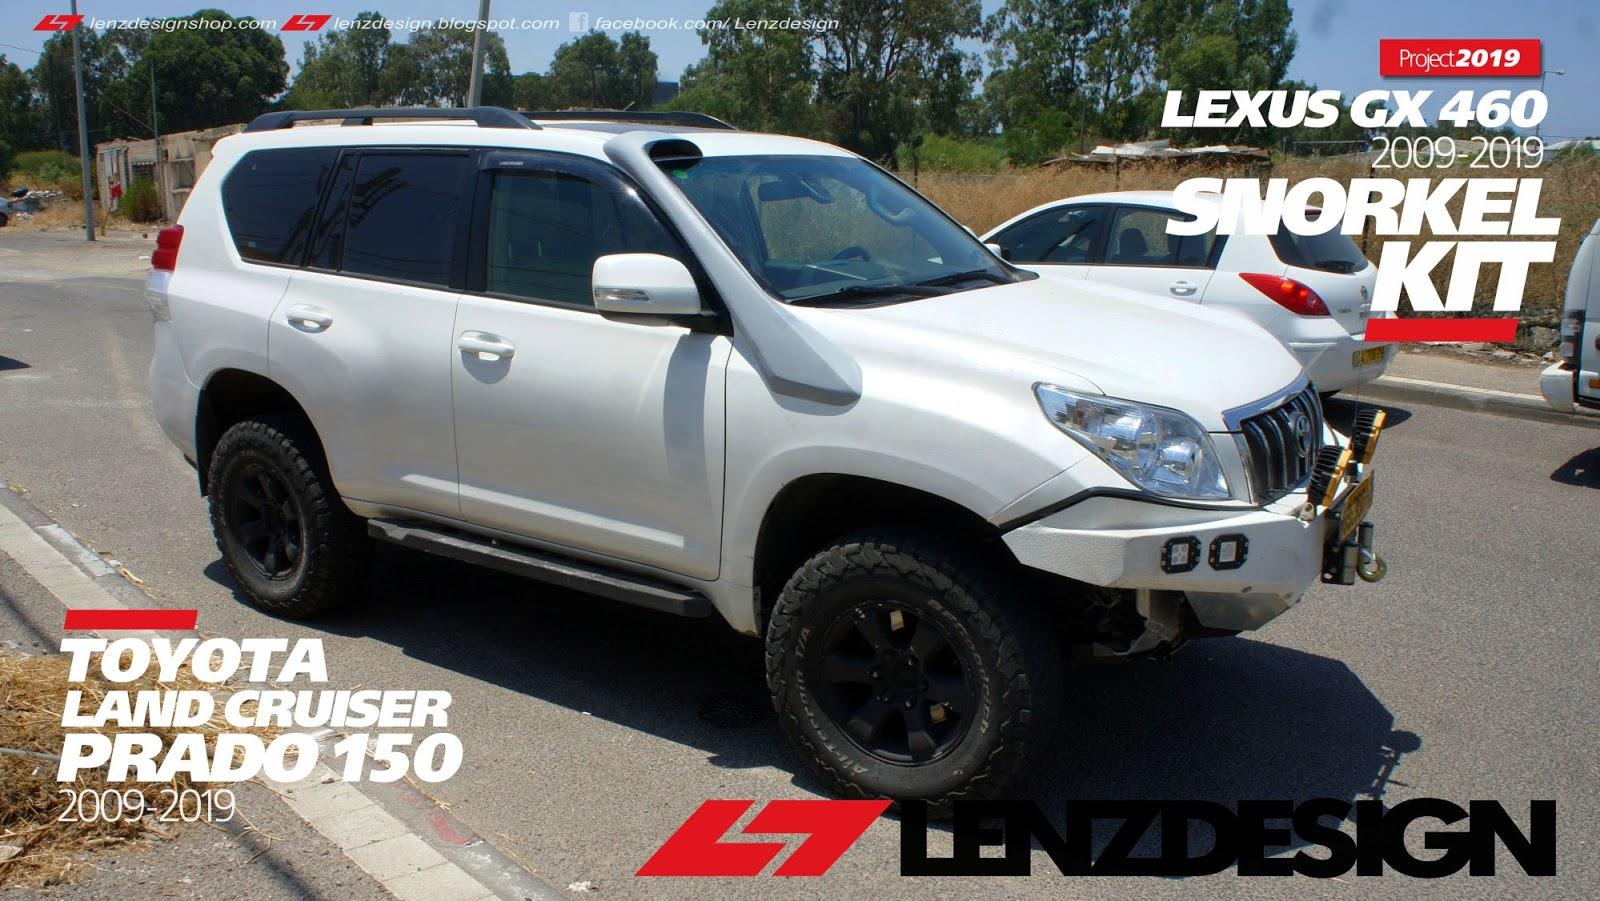 Lexus Land Cruiser